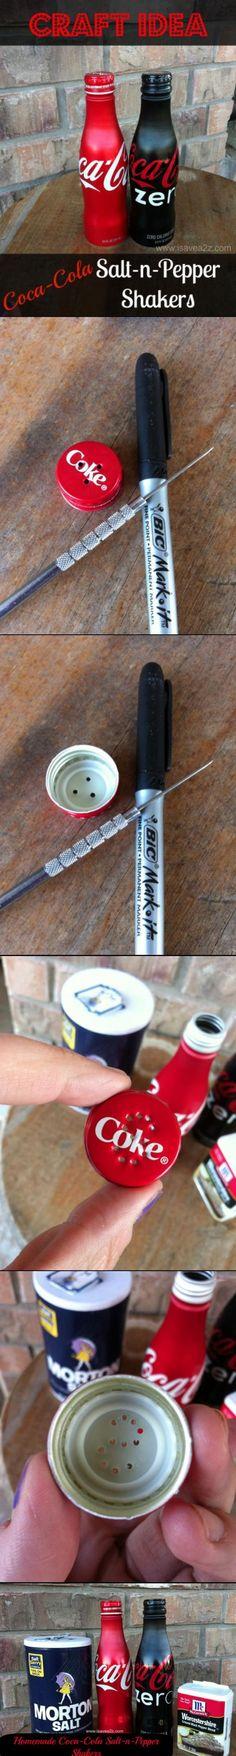 Coca-Cola Salt N Pepper Shakers HOMEMADE!!!  Super Cute and Easy too!: